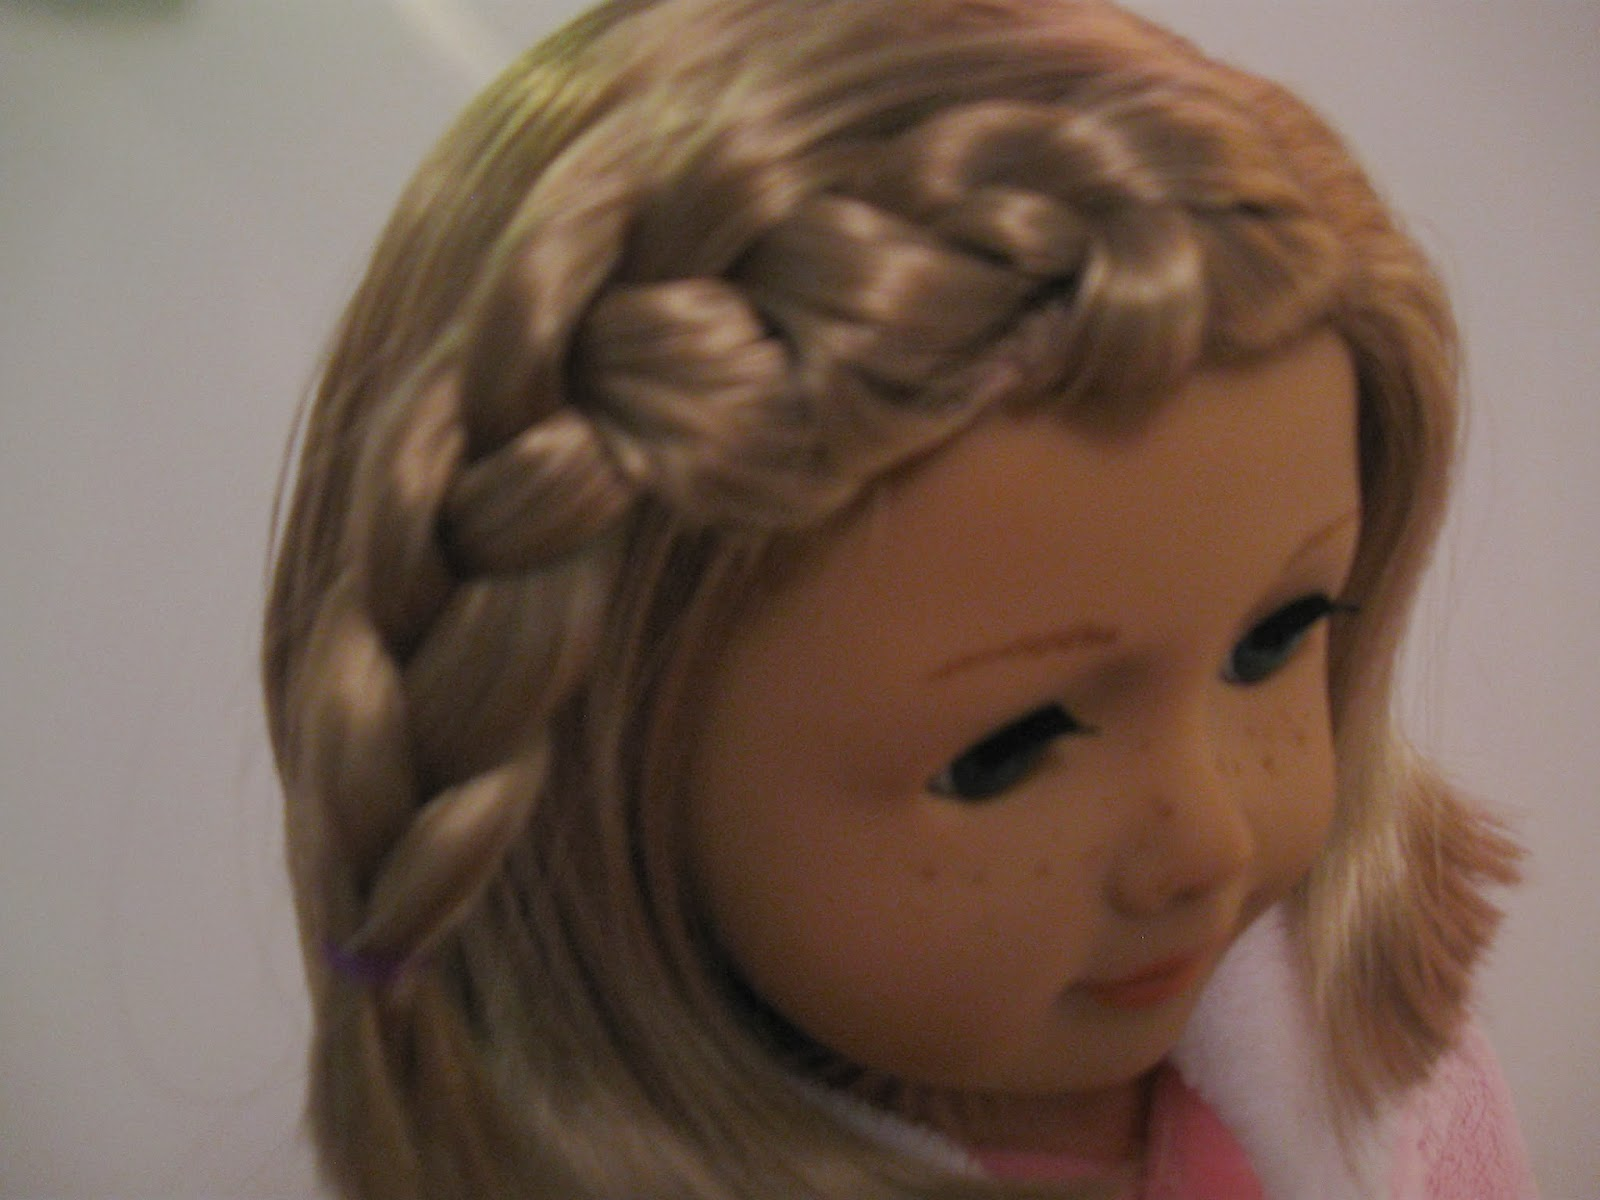 Seastar Studios Hairstyles for Dolls with Short Hair